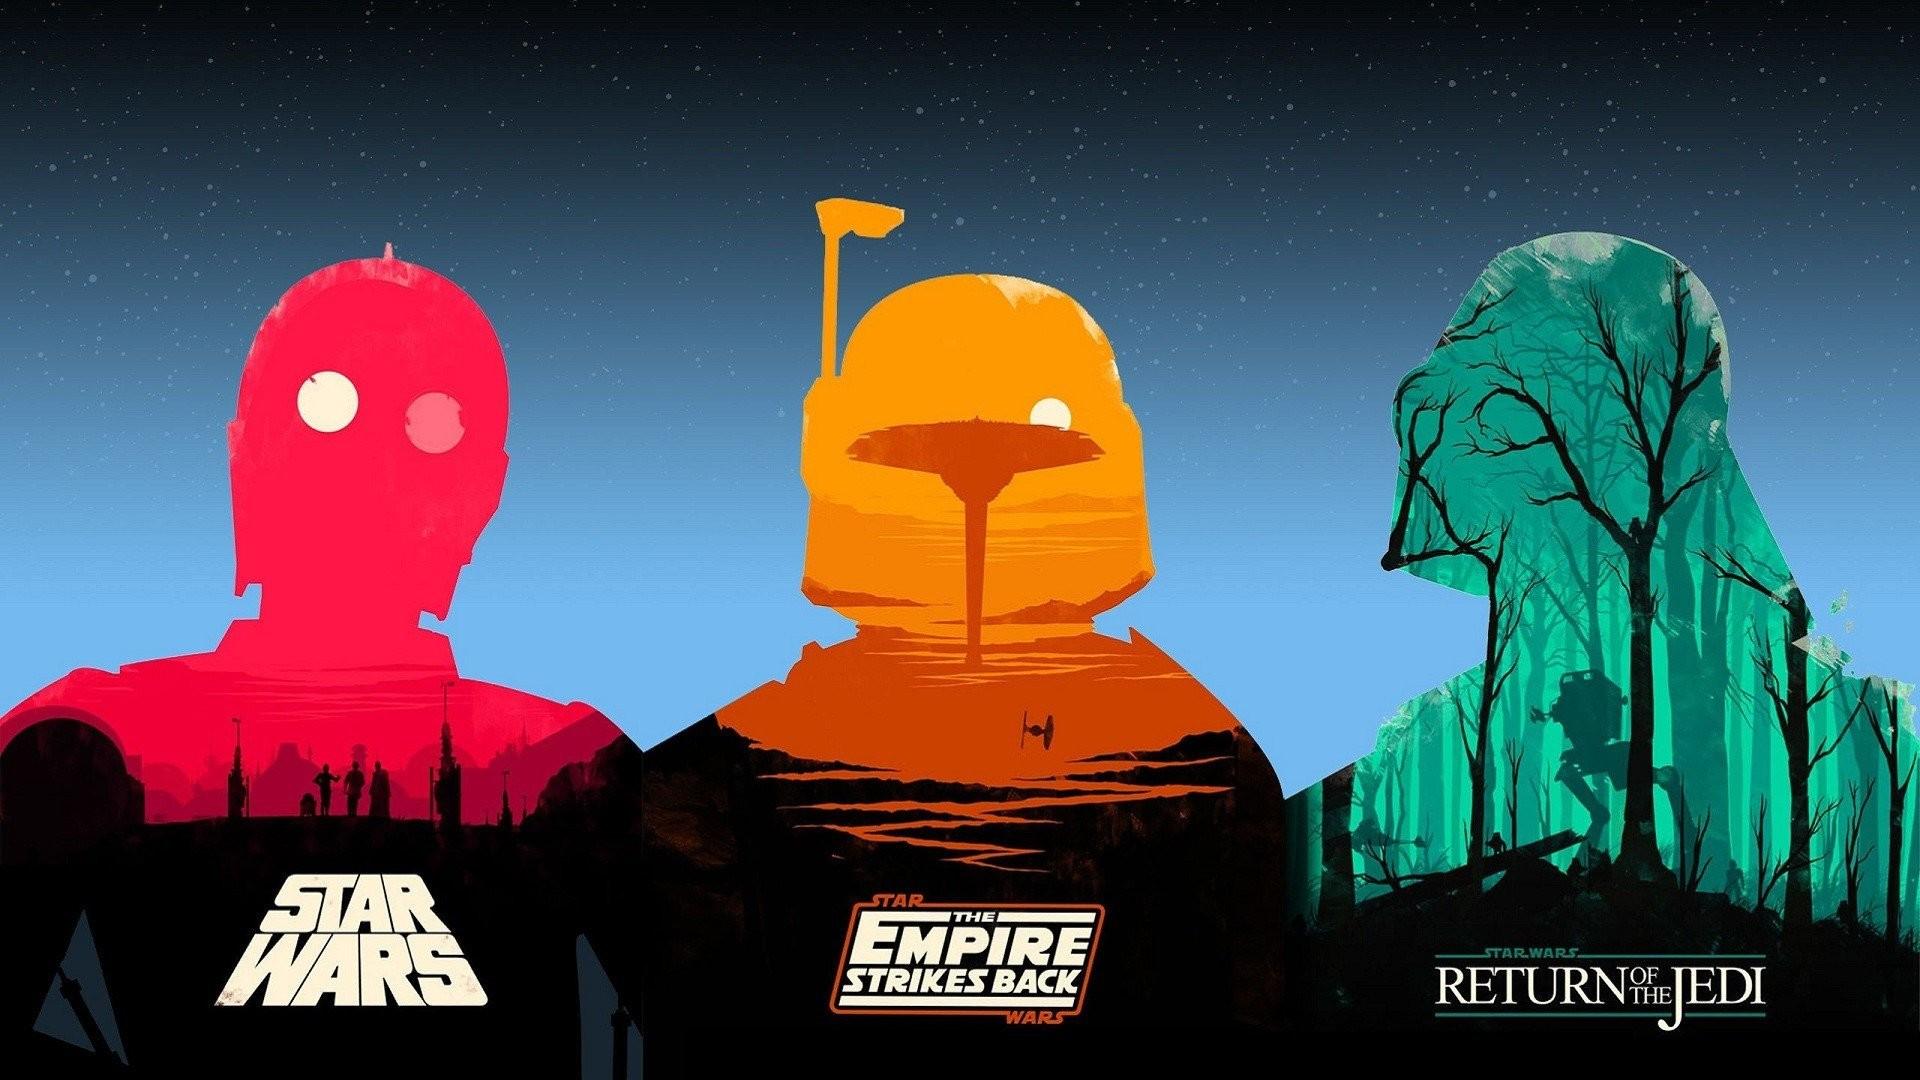 Star Wars The Empire Strikes Back Wallpaper